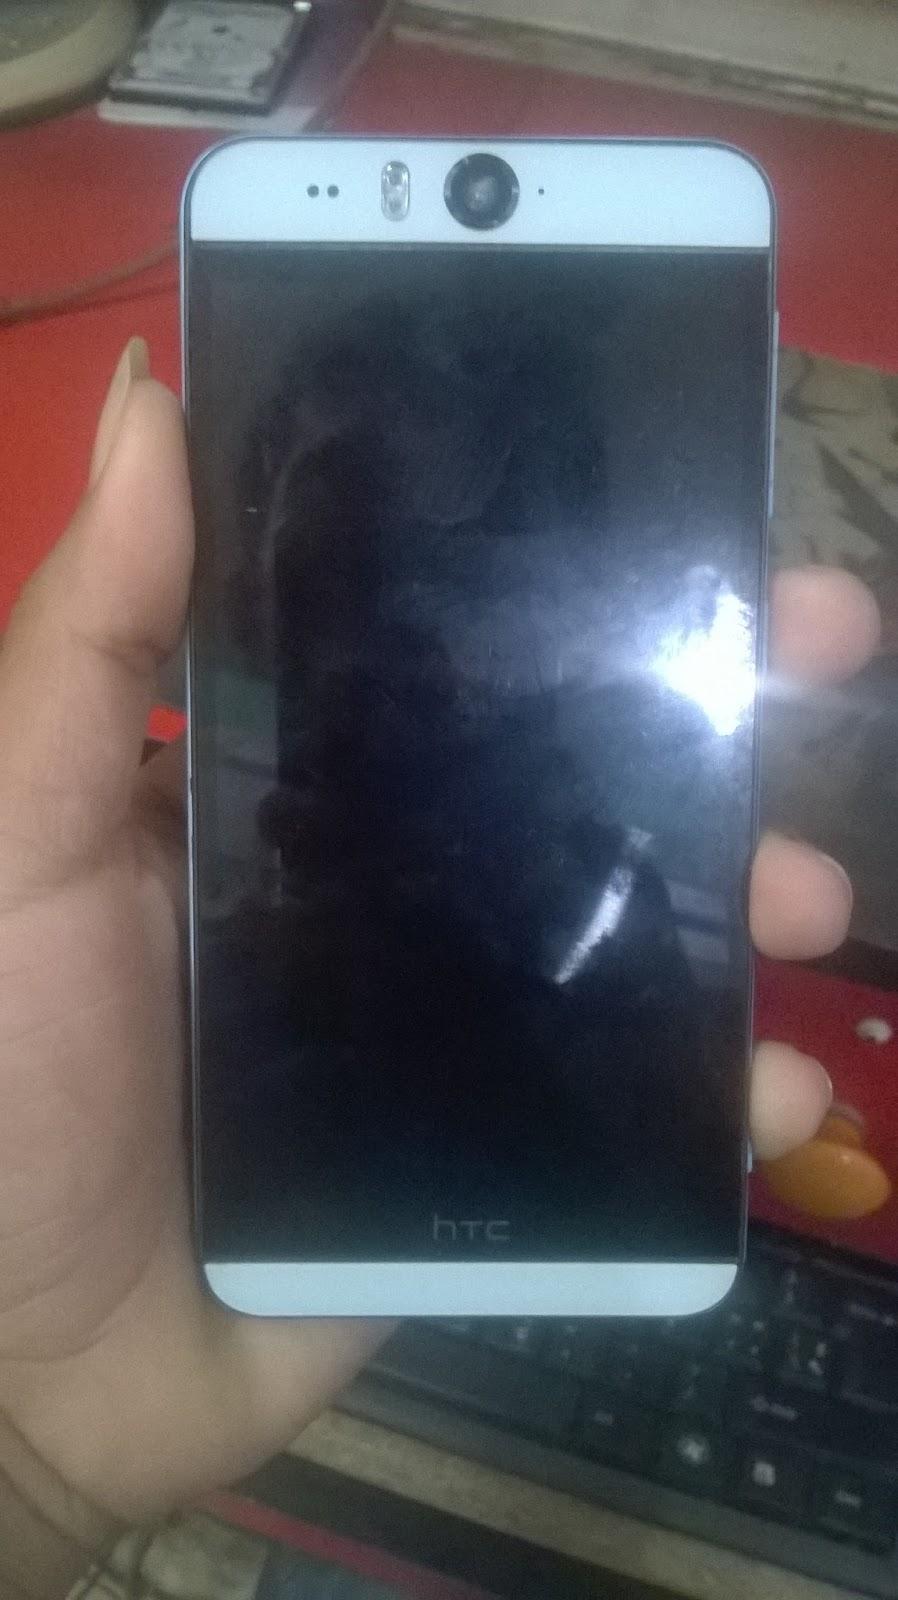 AR Telecom: HTC OPFH200 M910x Desire Eye MT6582 Official